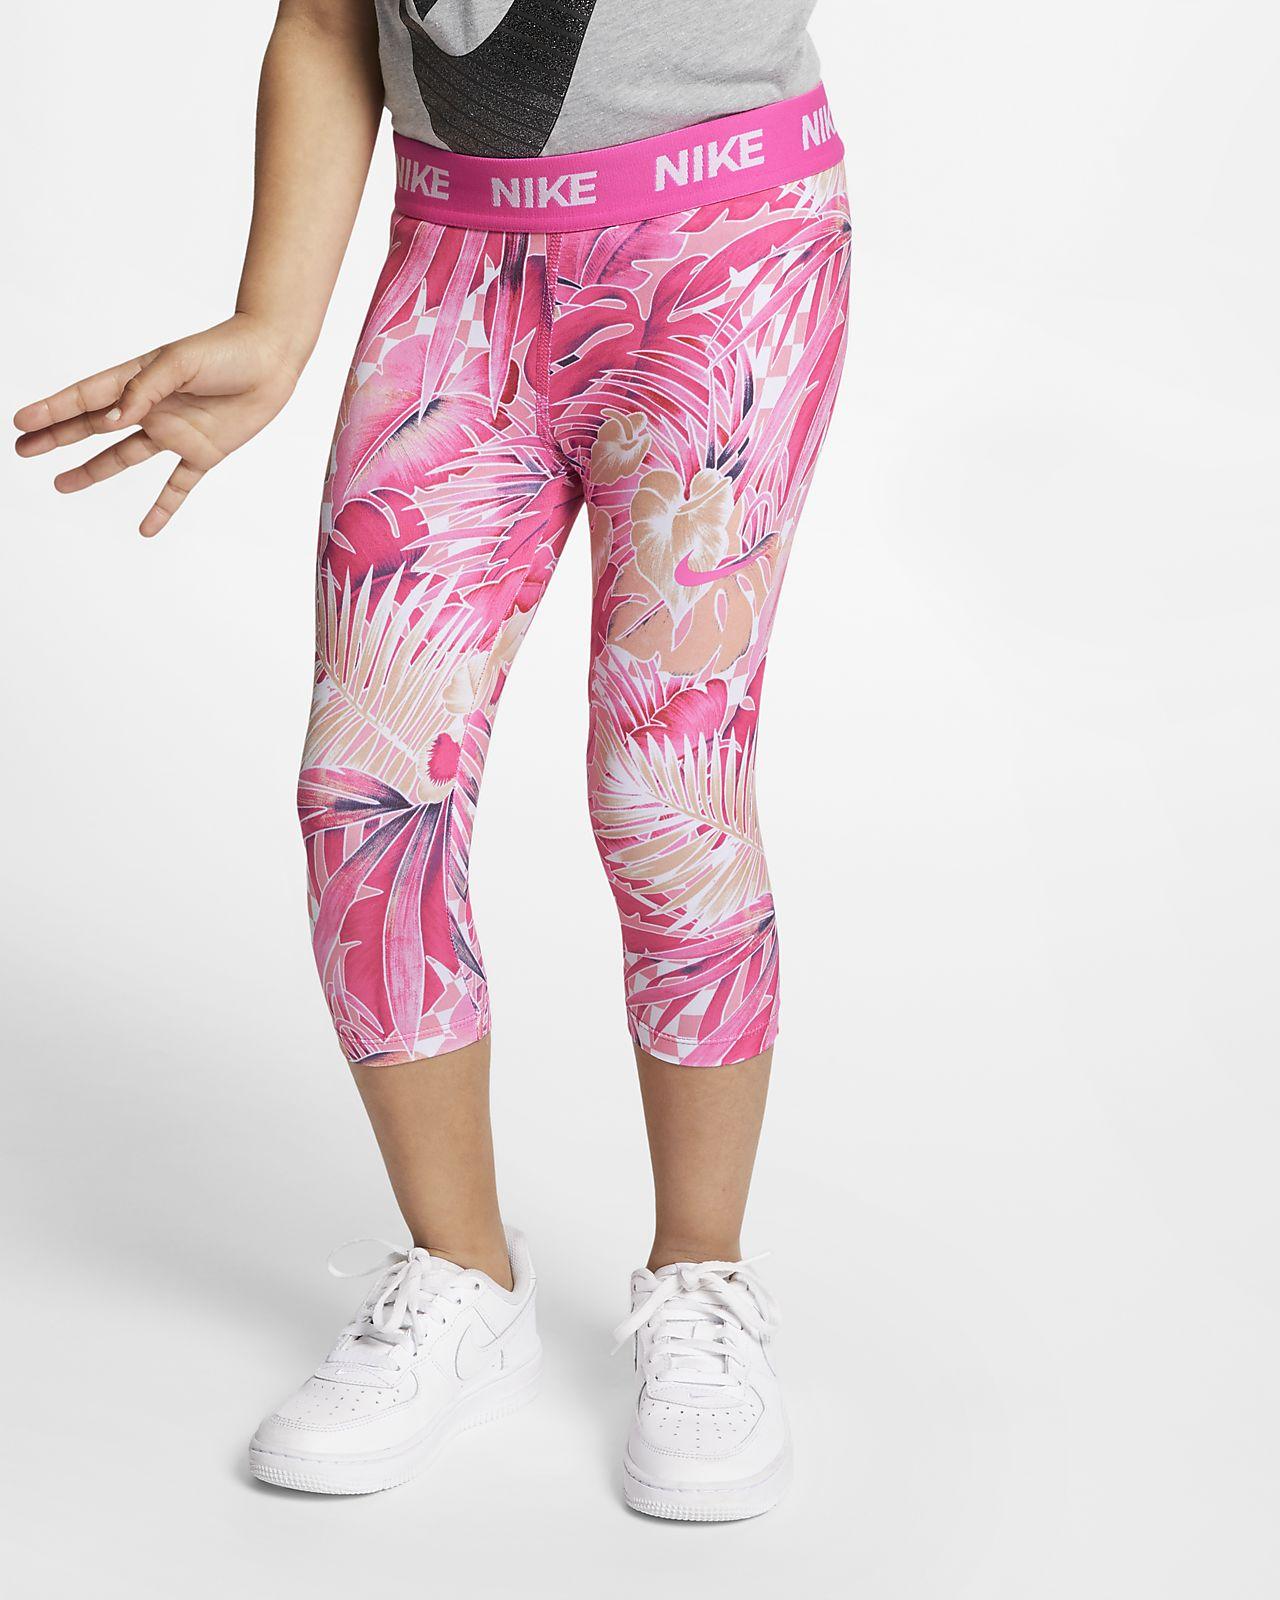 Nike Leggings estampats de 3/4 - Nen/a petit/a